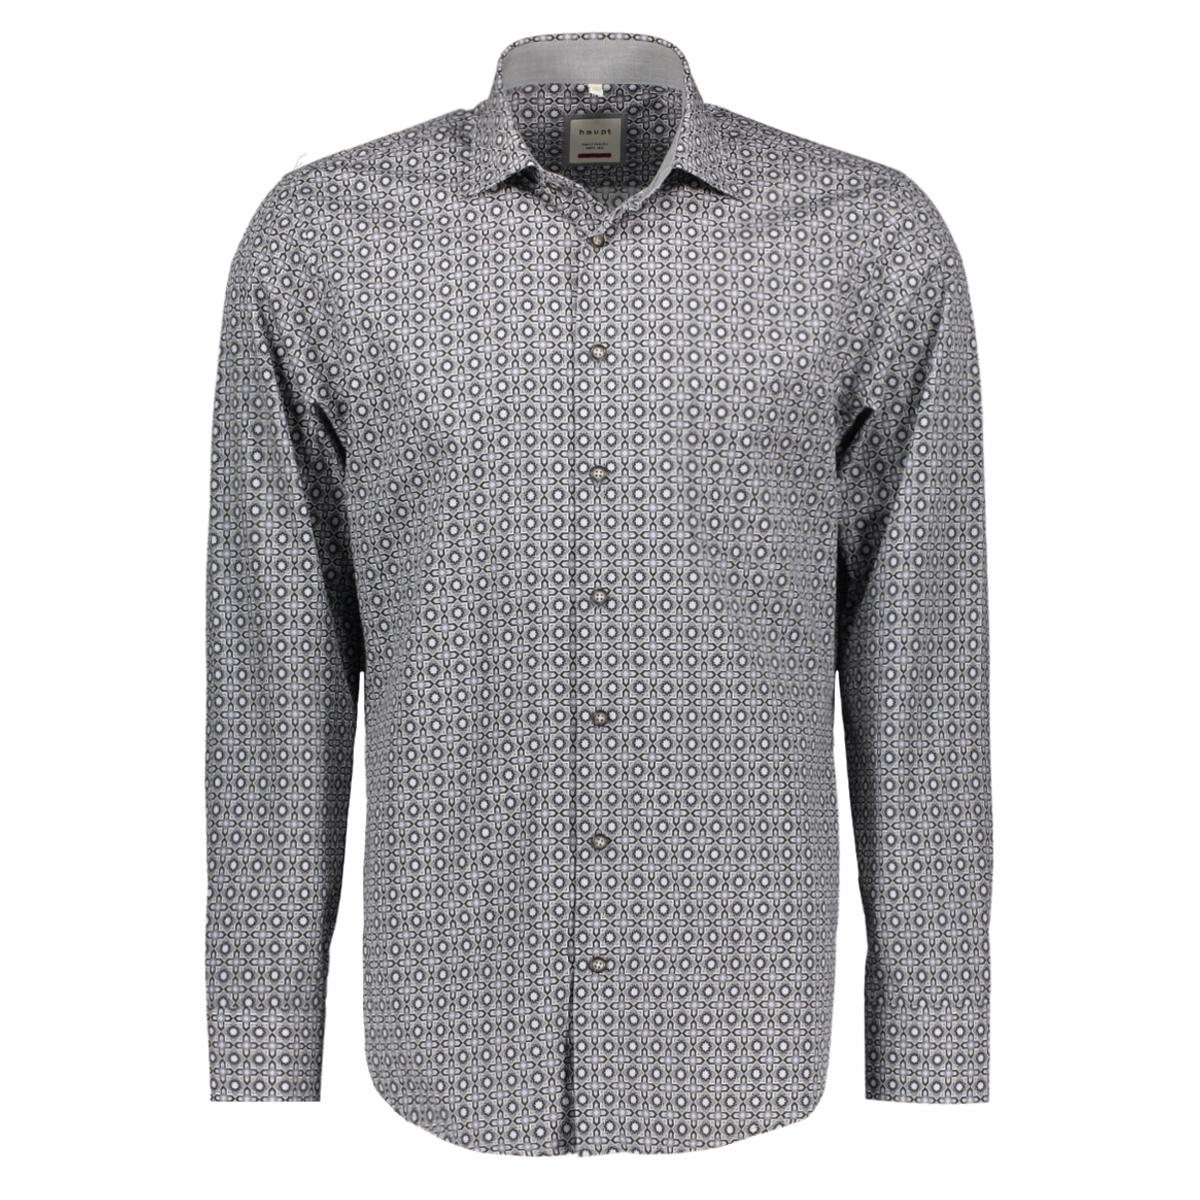 2320 7054 haupt overhemd 01